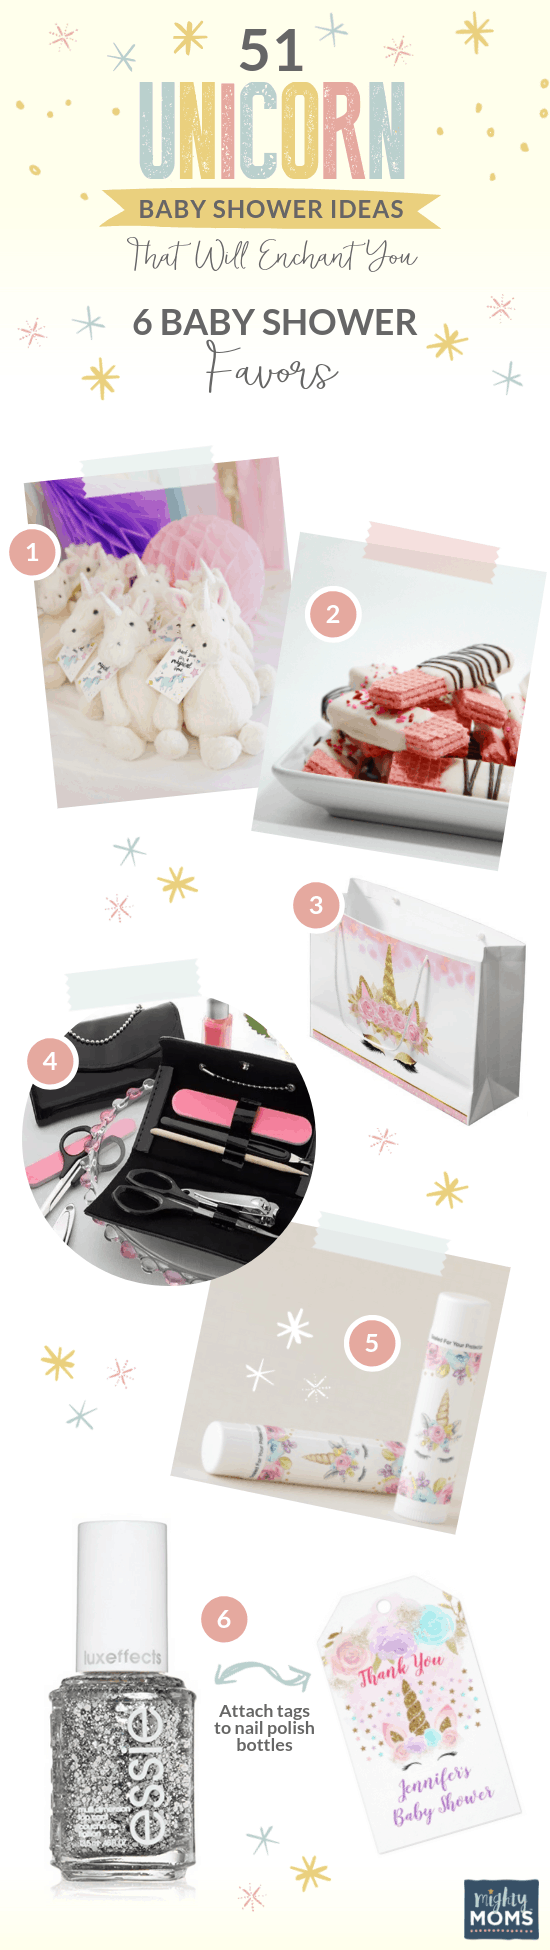 Fabulous Unicorn Baby Shower Favors - MightyMoms.club